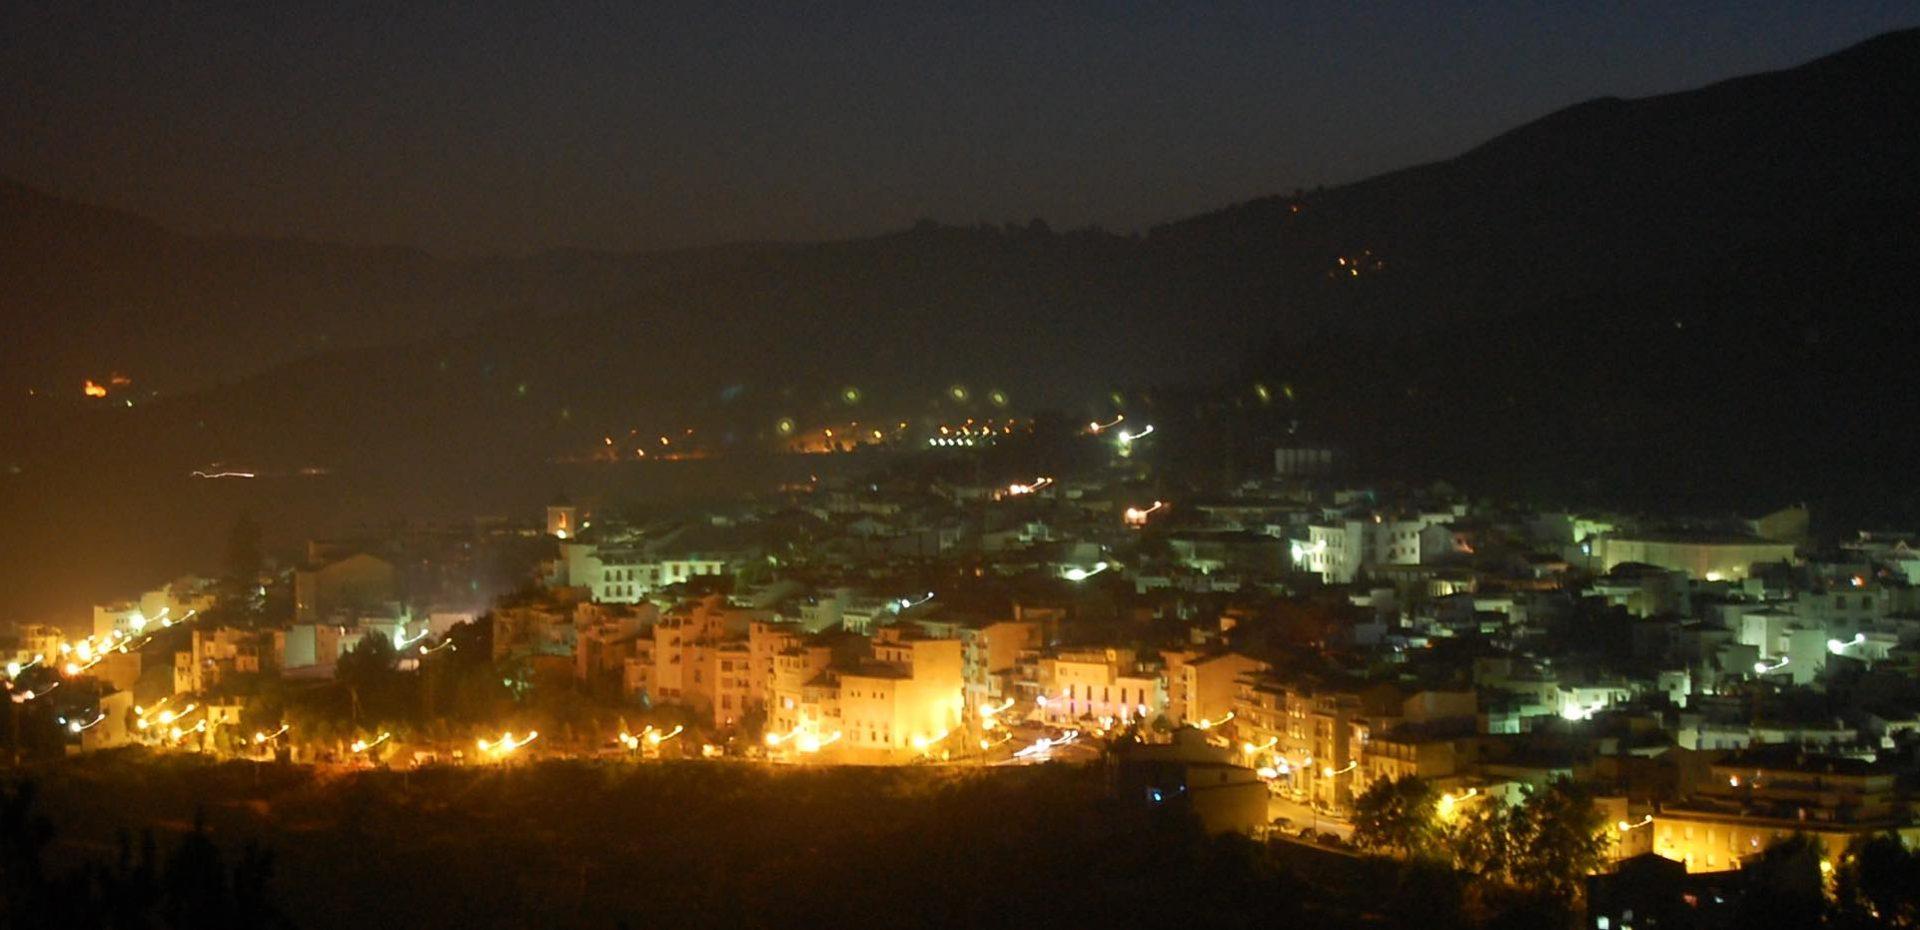 Lanjarón at night, Andalucia, Spain